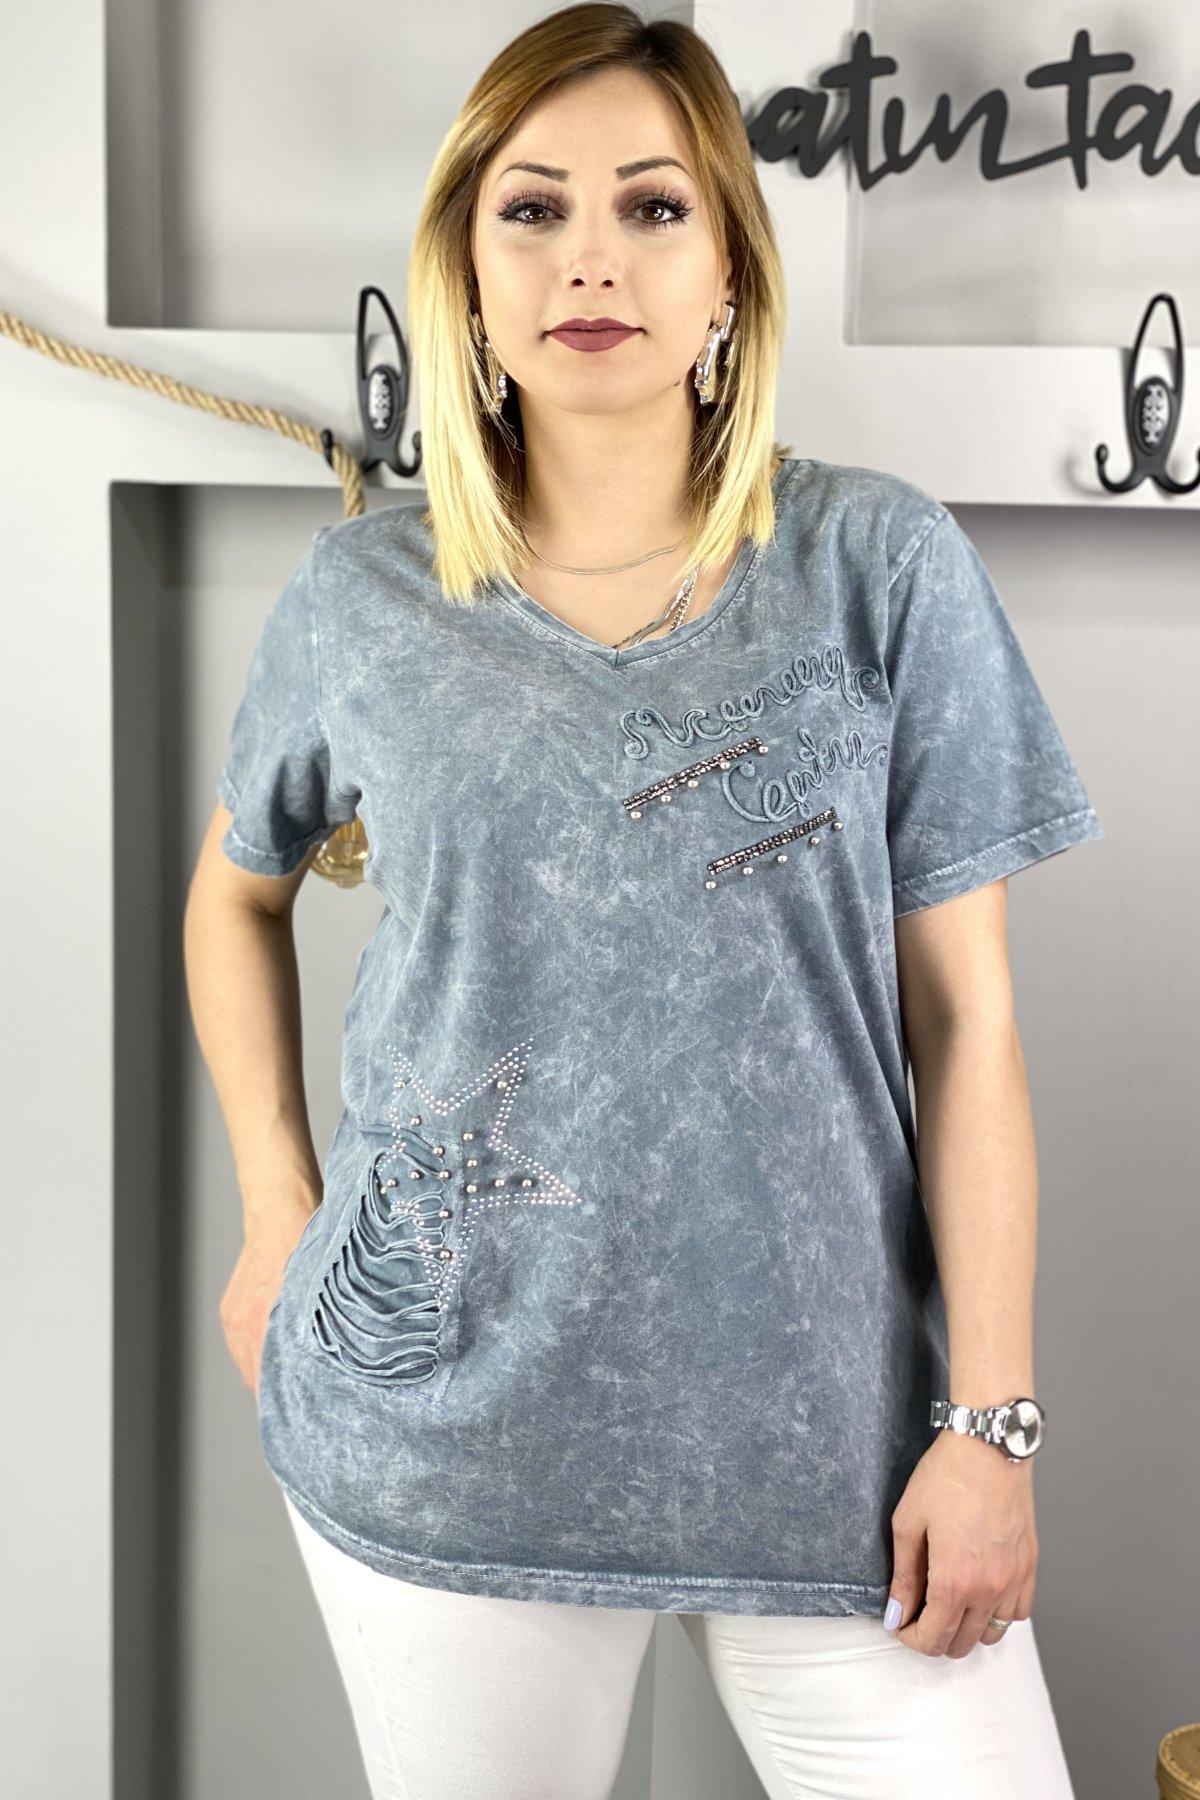 https://resim.chicbag.com.tr/p000669/gri/sol-gogus-ustu-yazili-sag-tarafi-kesik-ustune-yildiz-detayli-v-yaka-kisa-kollu-t-shirt-01254e7e7a0b.jpg